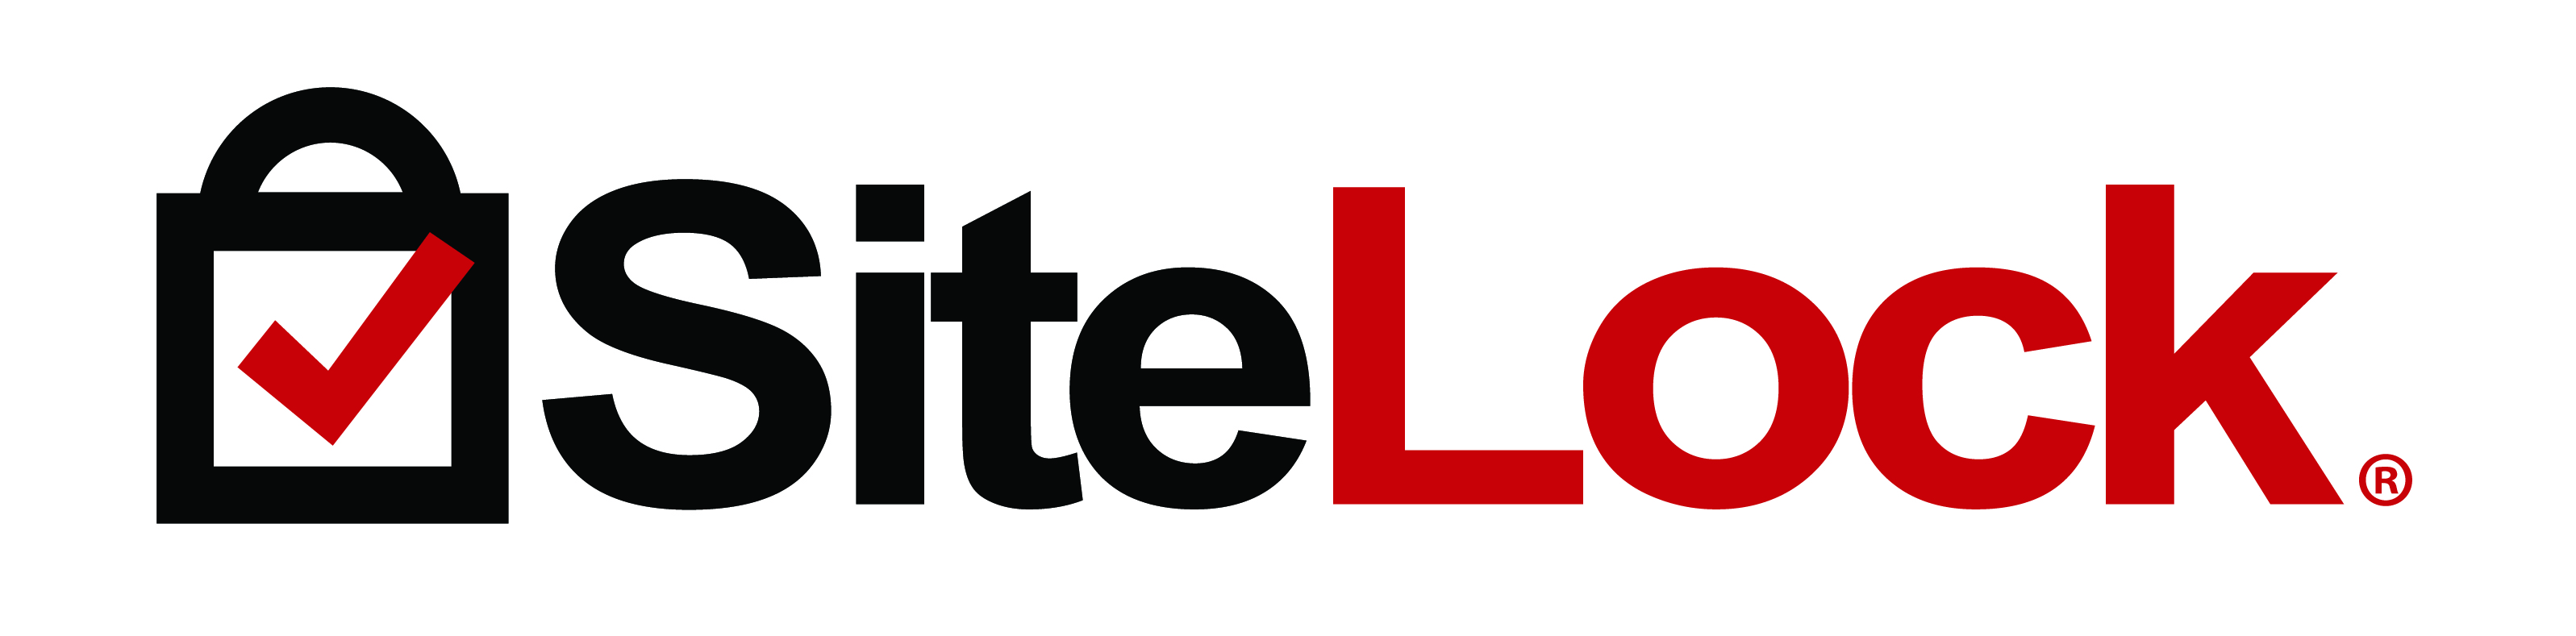 SiteLock-Logo-BlackRed-highRes-01